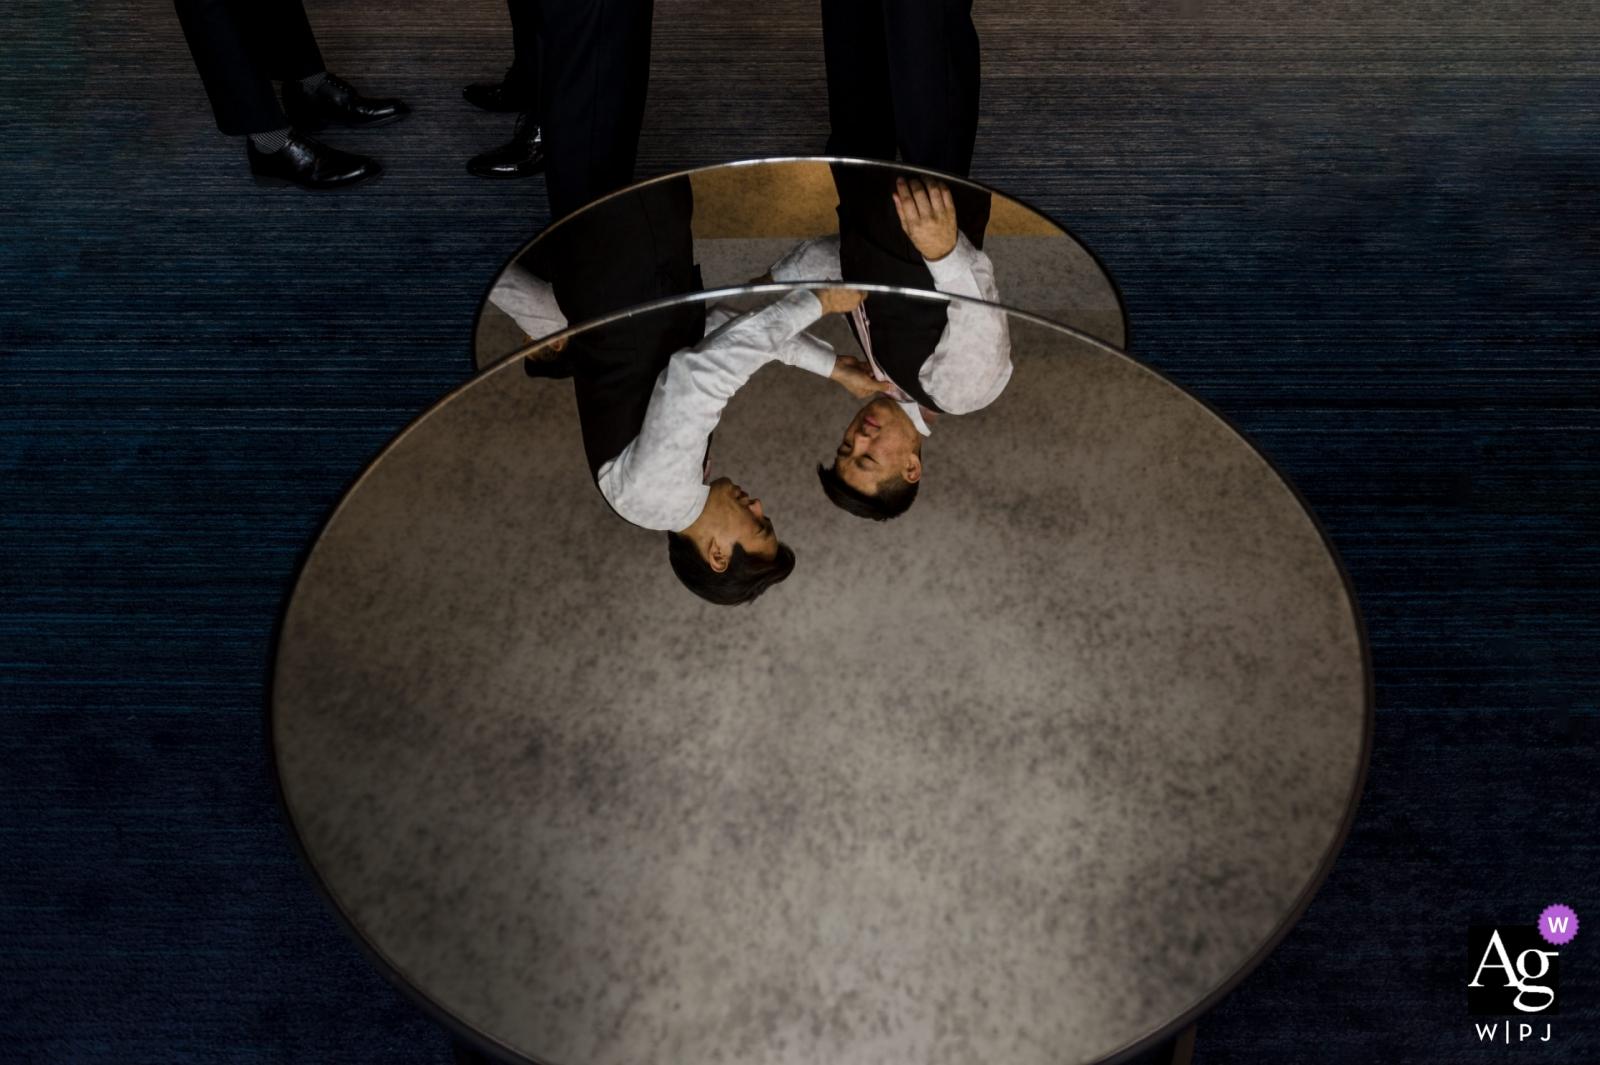 W Hotel Midtown Atlanta wedding venue pictures: Getting Ready reflection of groomsmen